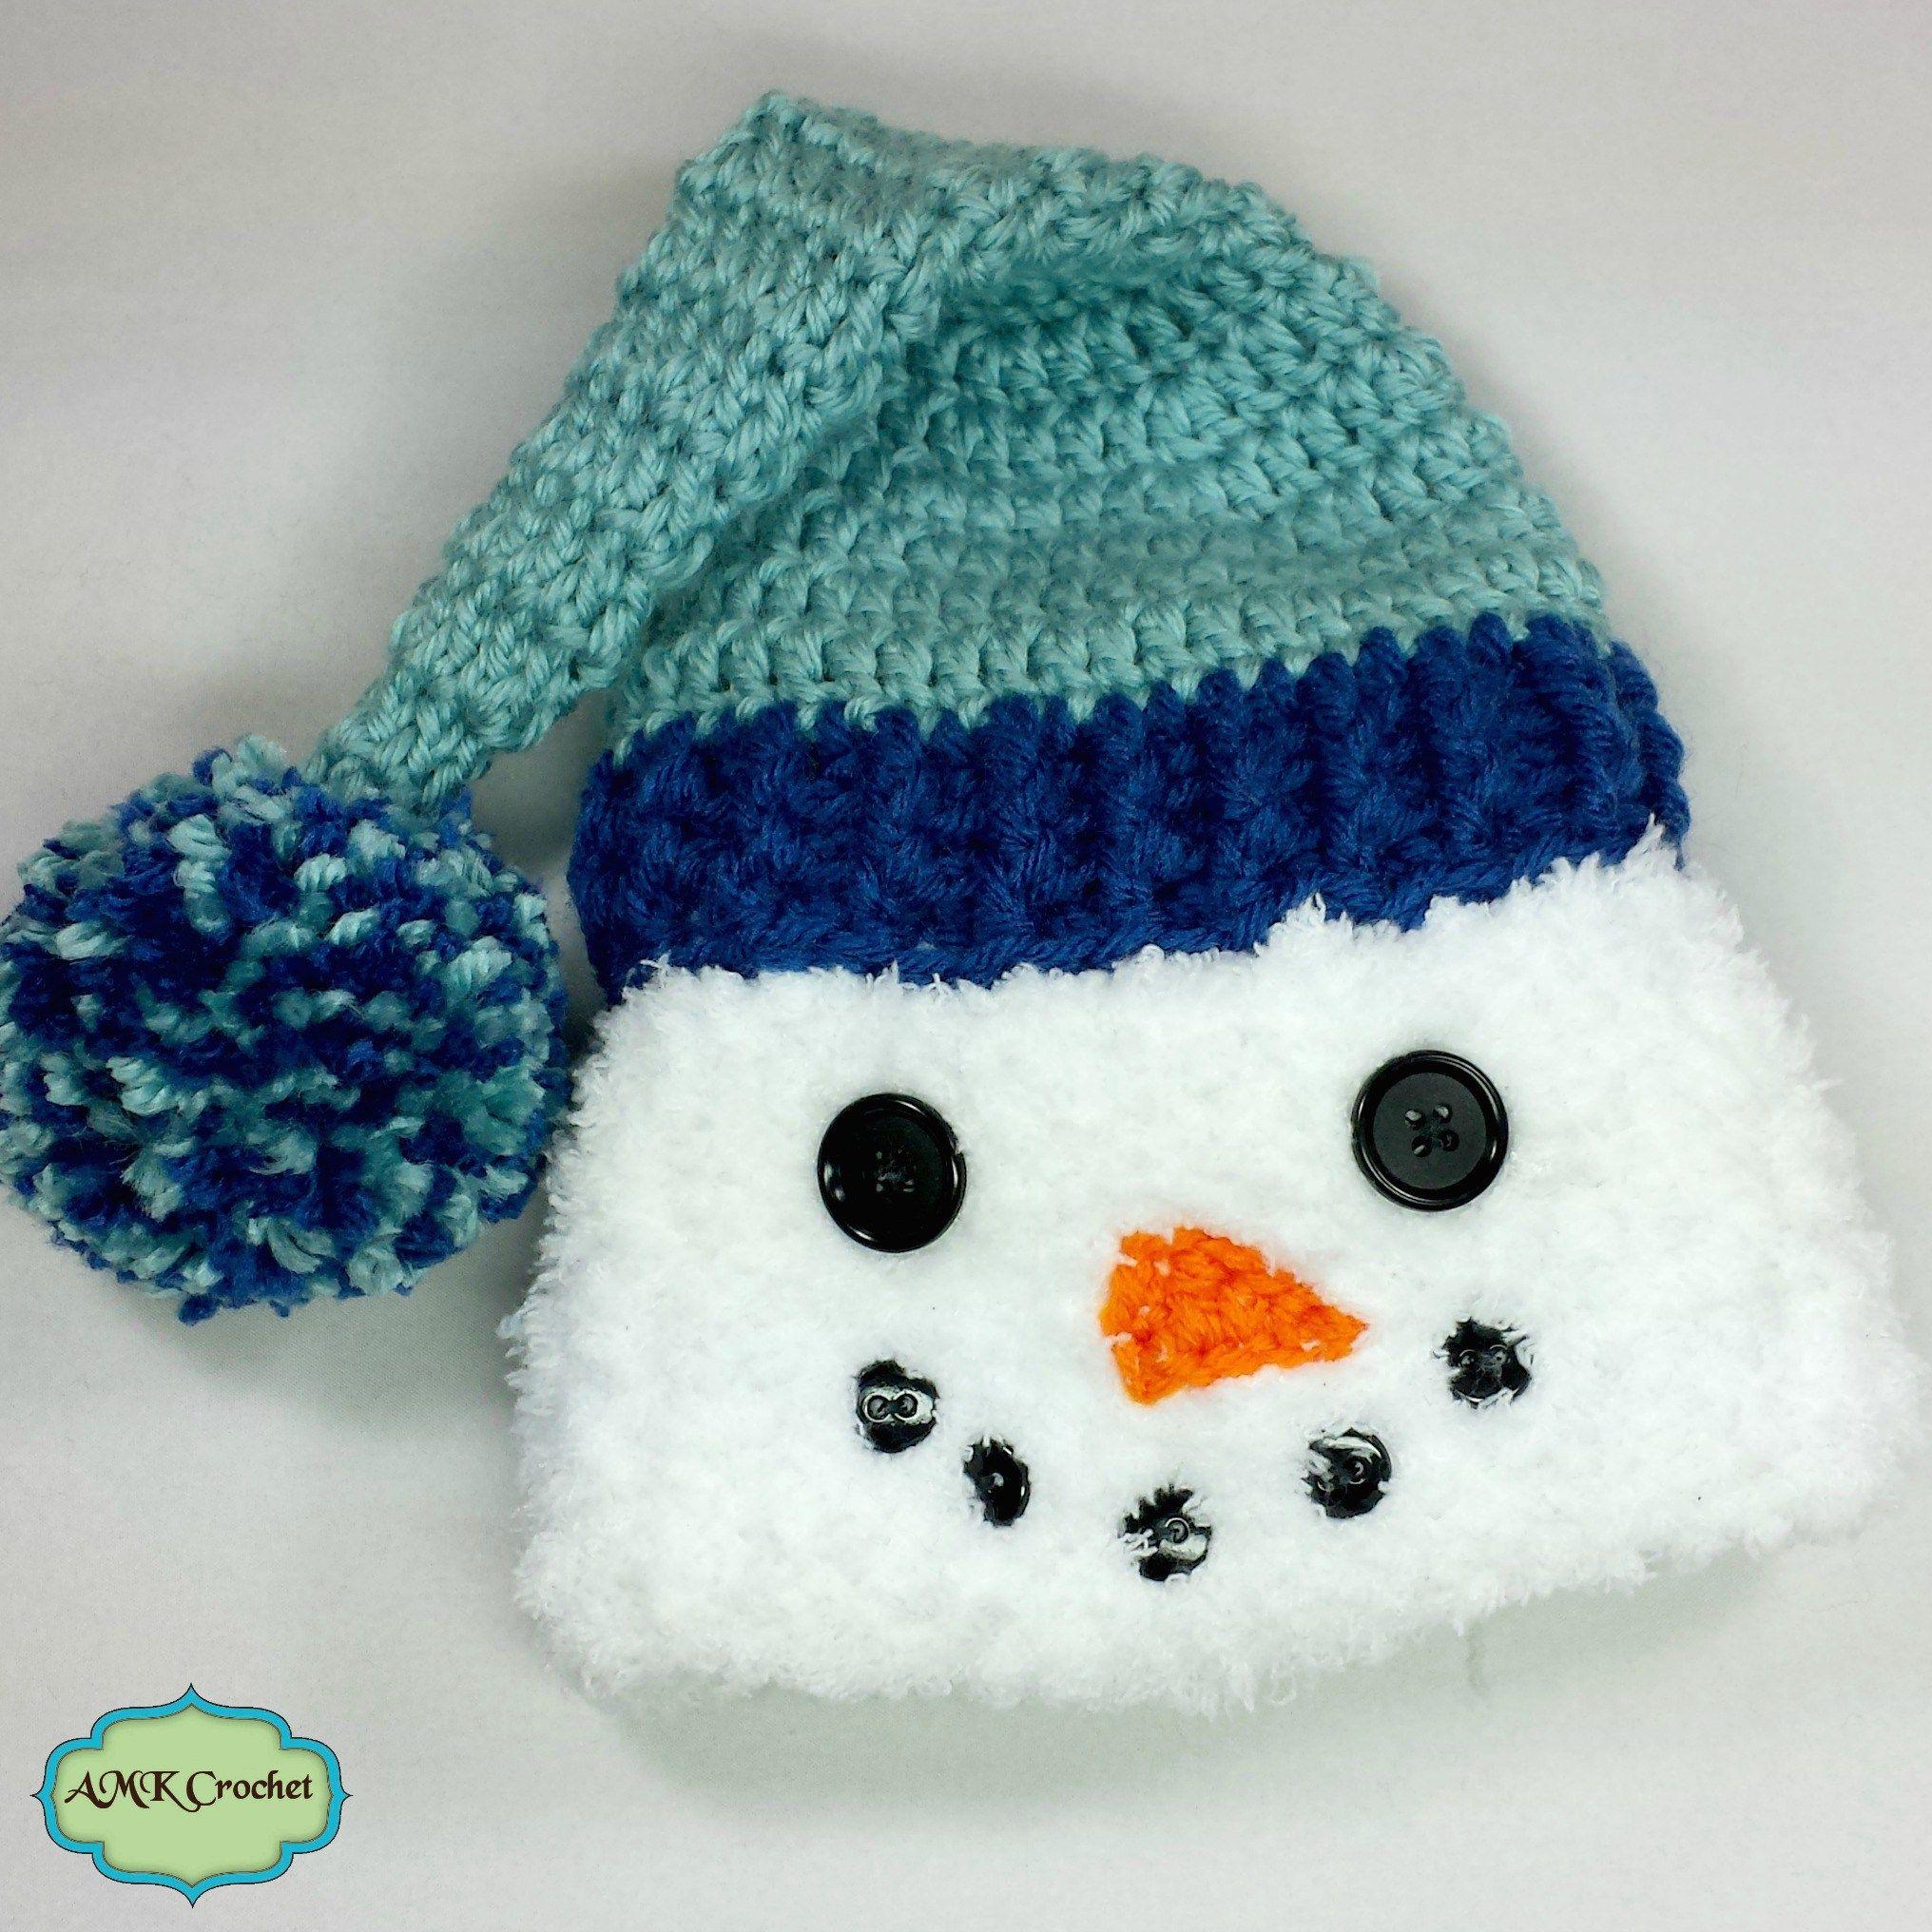 Crochet Newborn Snowman Hat Pattern by AMKCrochet.com | Crochet ...